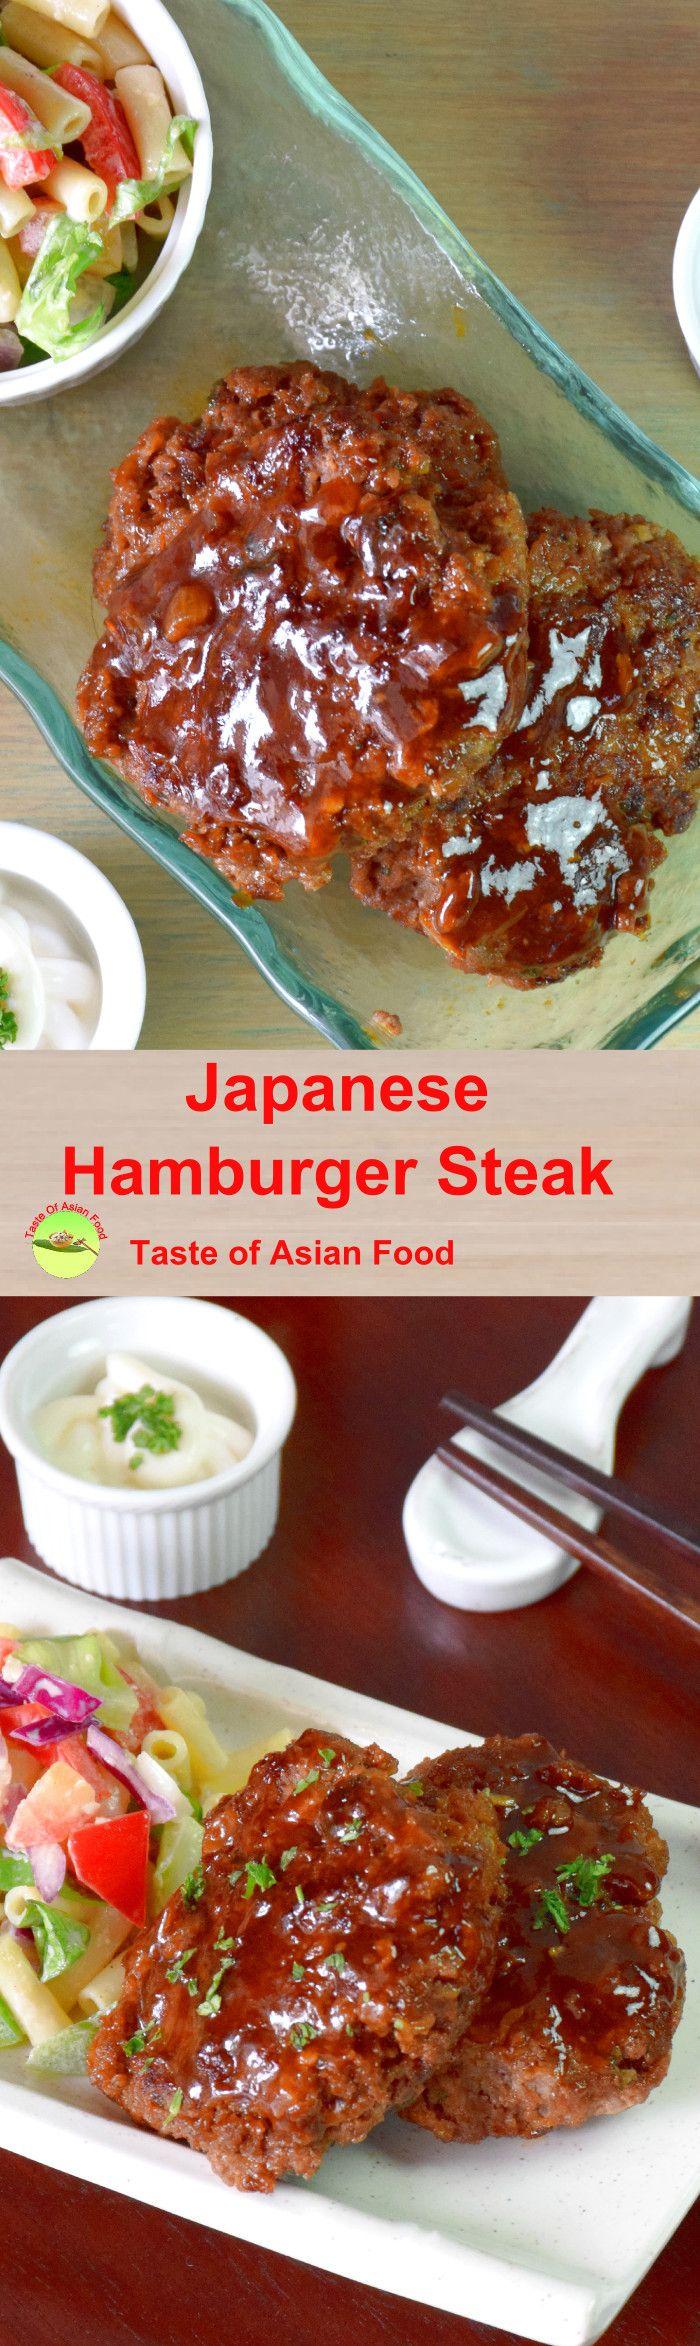 hamburger or steak, try Hambagu, the Japanese style Hamburger steak ...